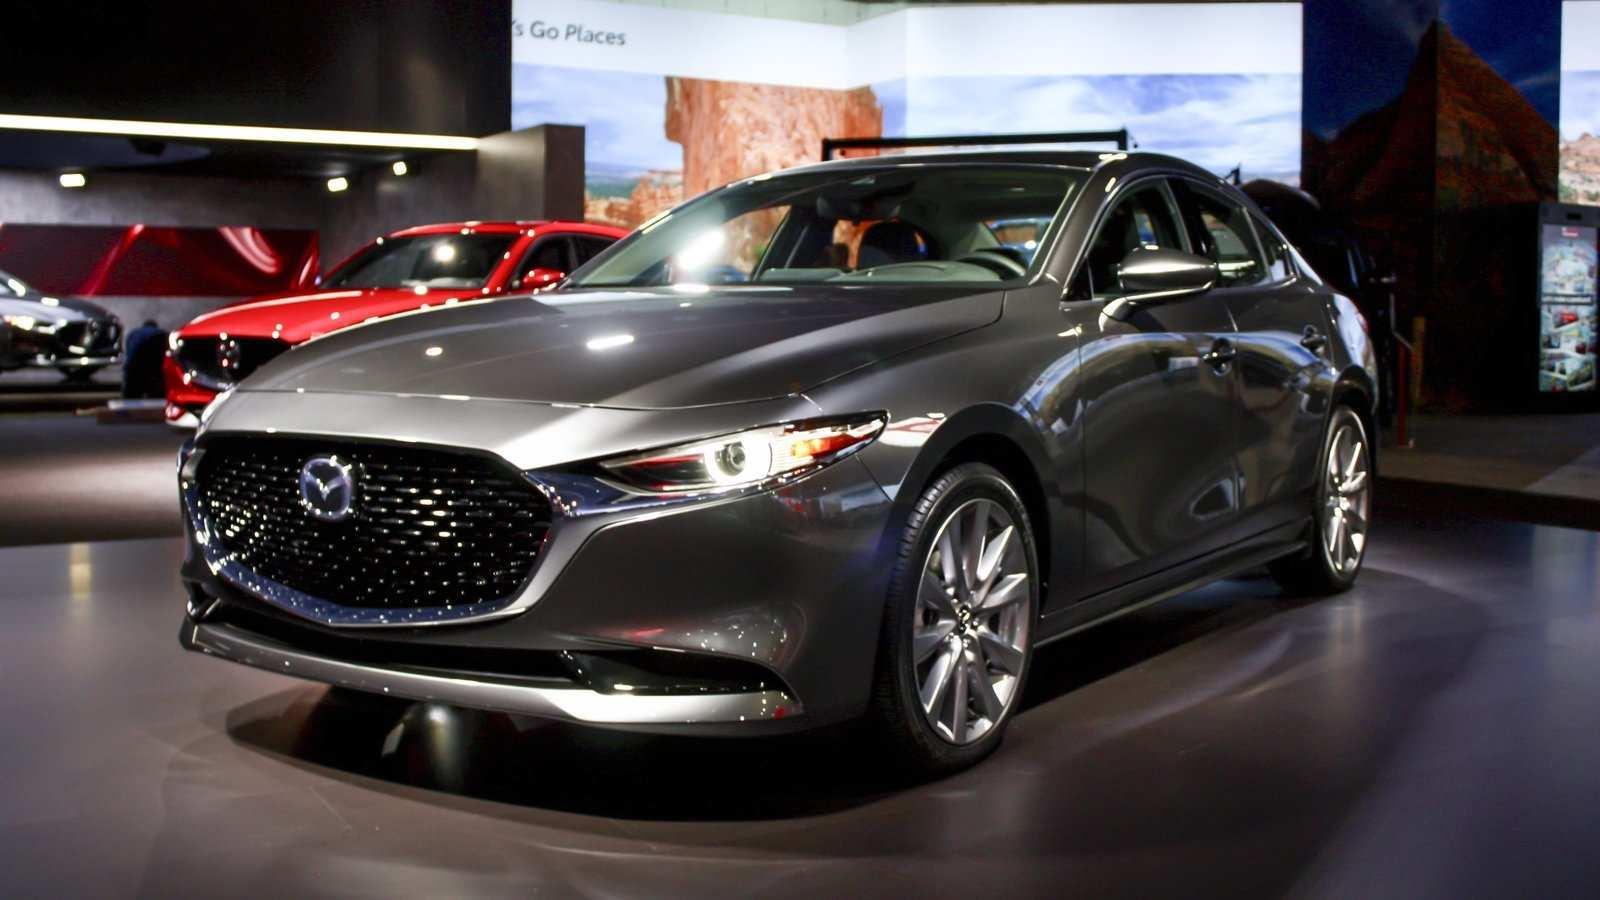 78 Gallery of New Mazda Kodo 2019 Release Date Speed Test with New Mazda Kodo 2019 Release Date